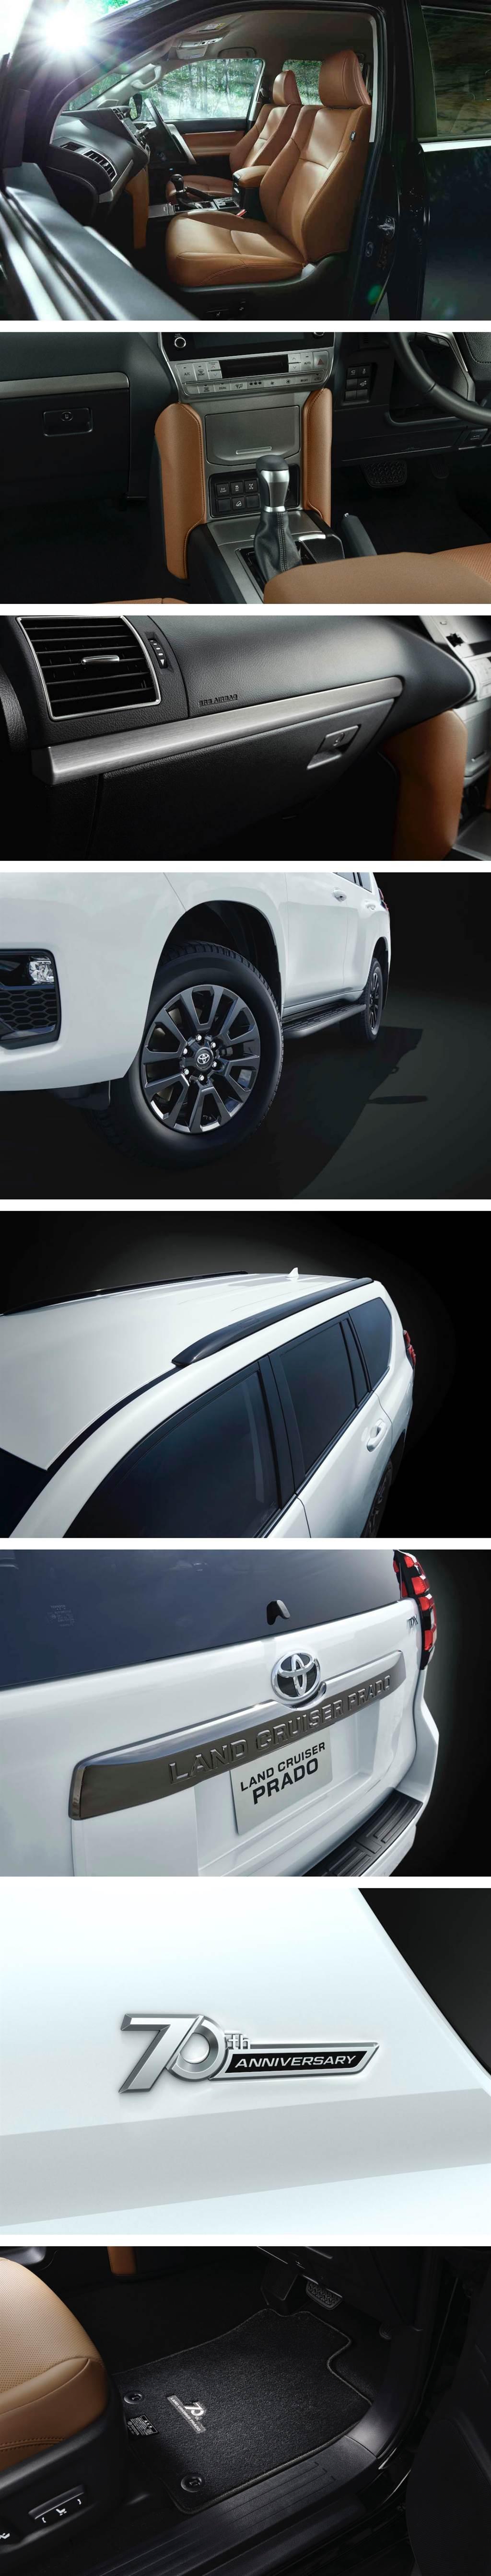 慶賀 70 年越野榮耀,Toyota Land Cruiser Prado「70th Anniversary Limited」 特別仕樣車日本限定發售